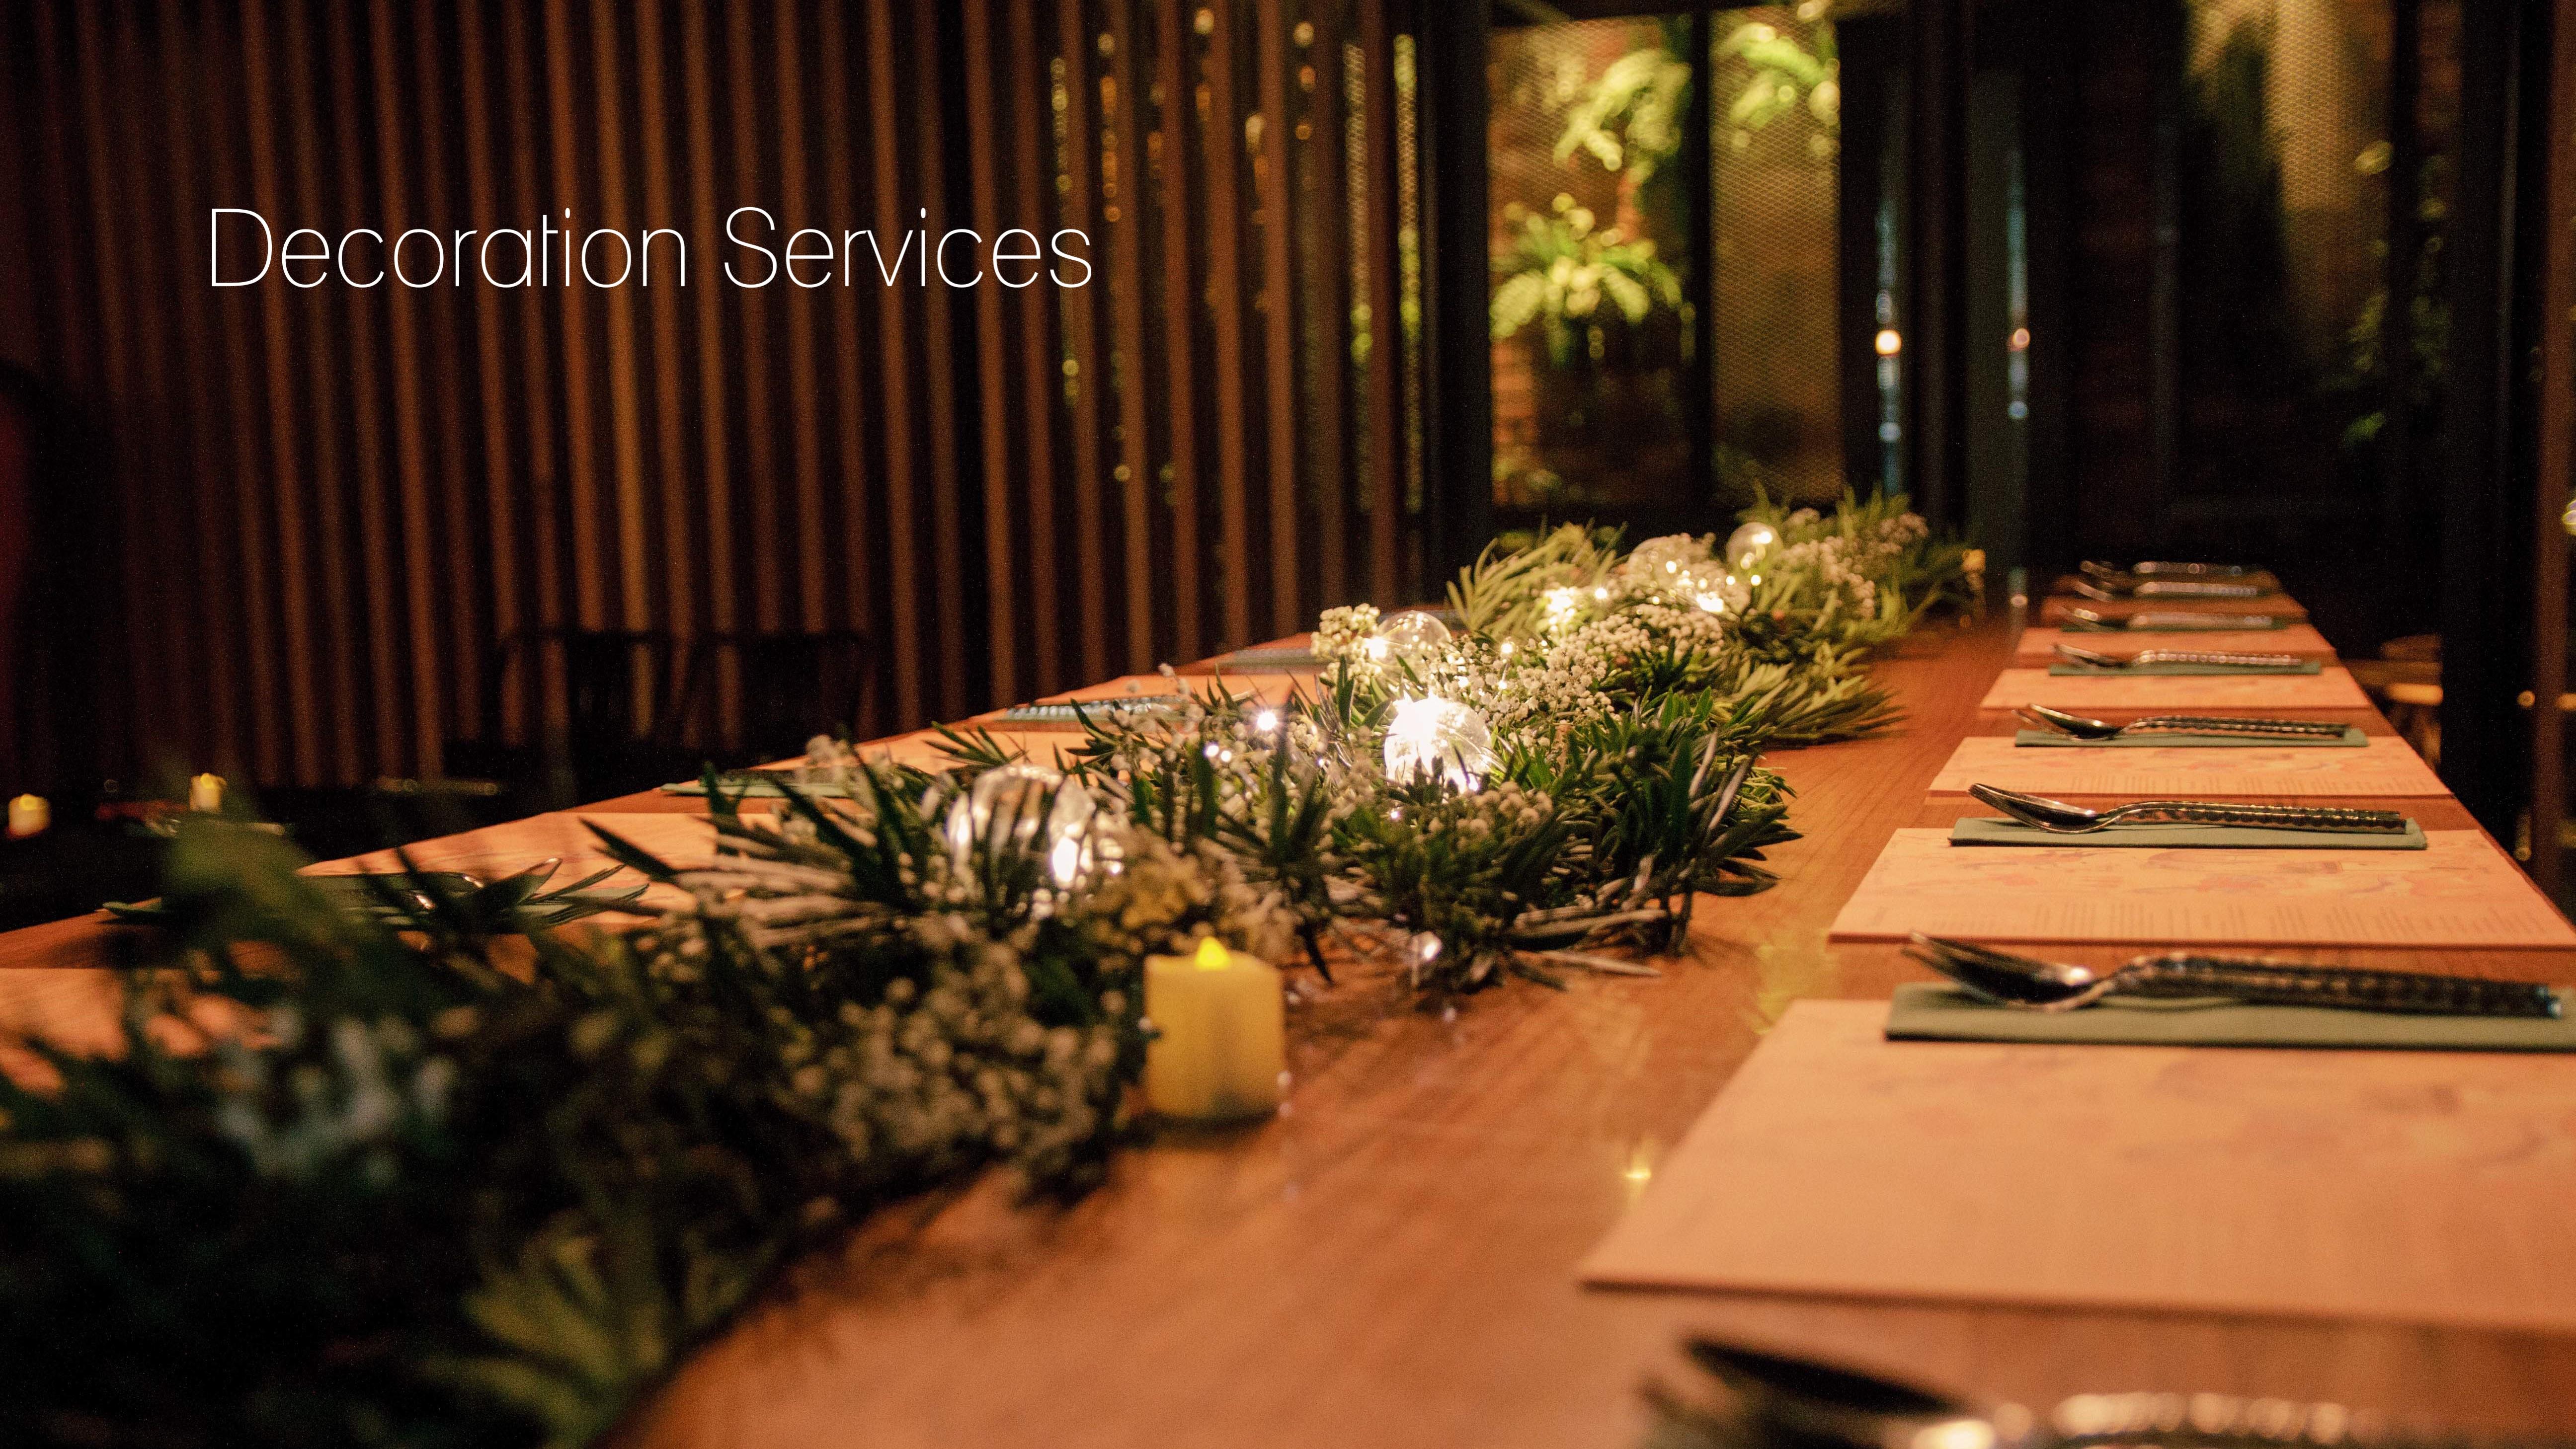 DecorationServices.jpg